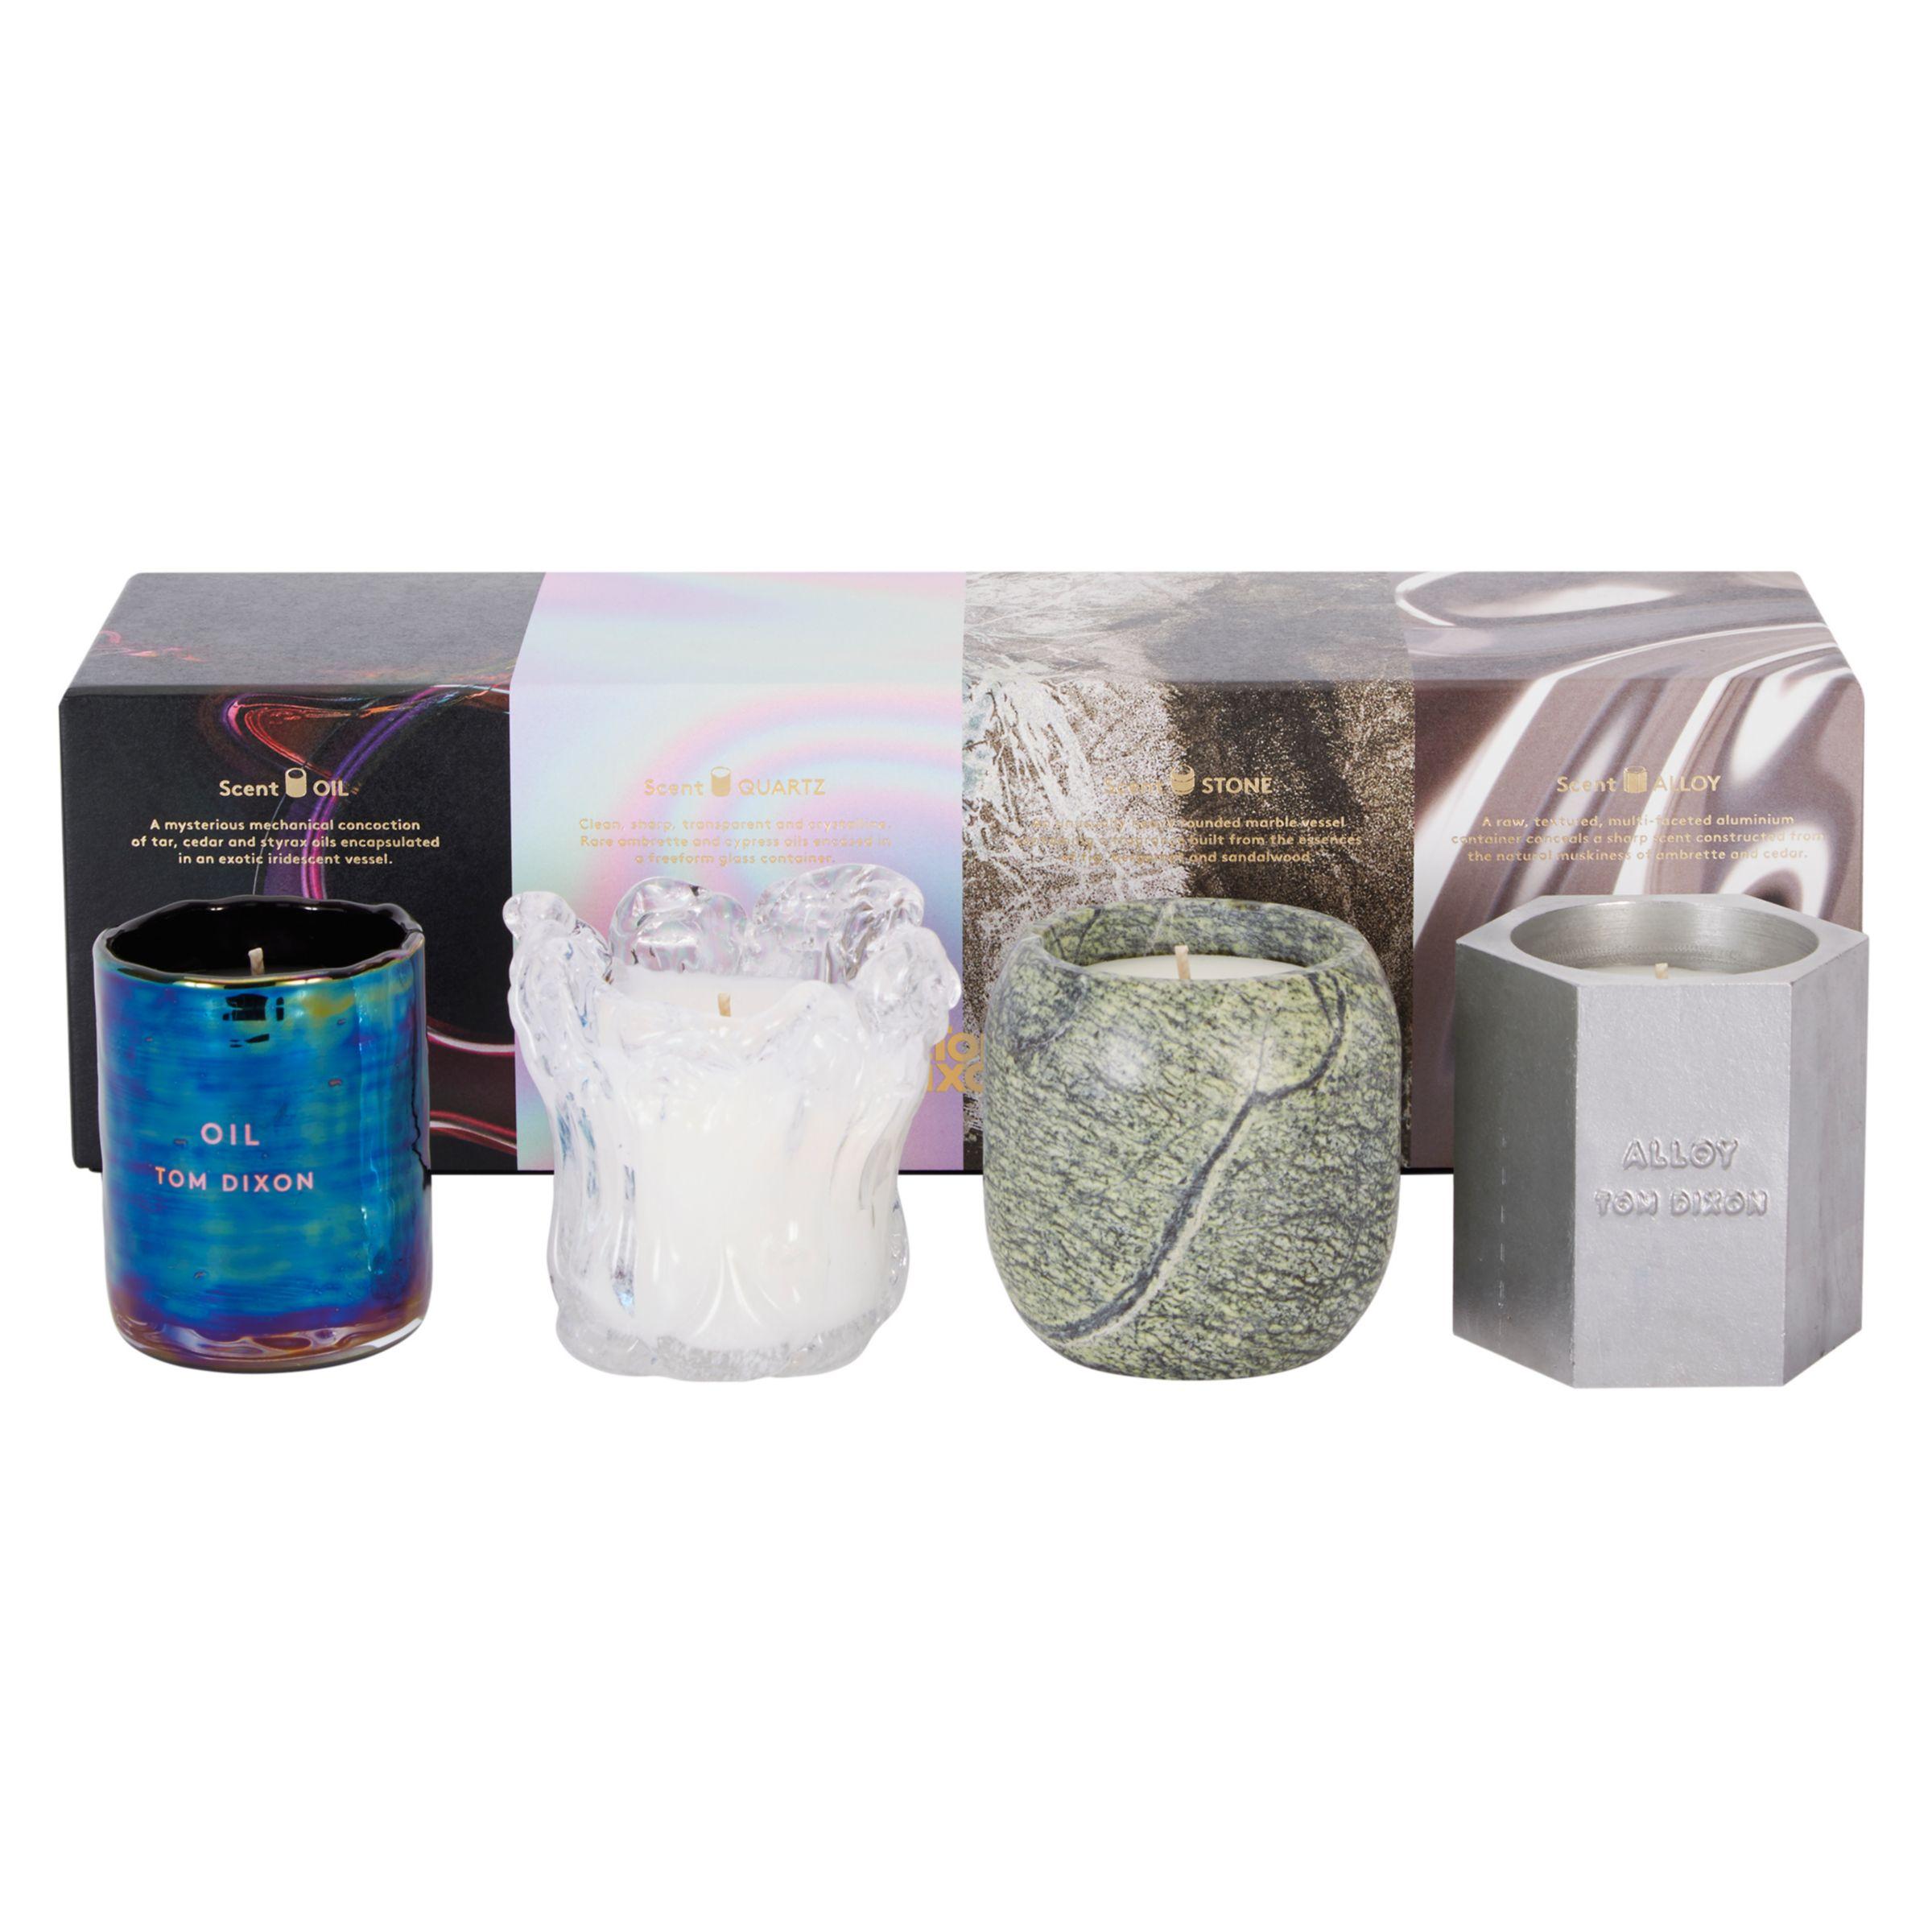 Tom Dixon Tom Dixon Materialism Scented Candle Luxury Gift Set